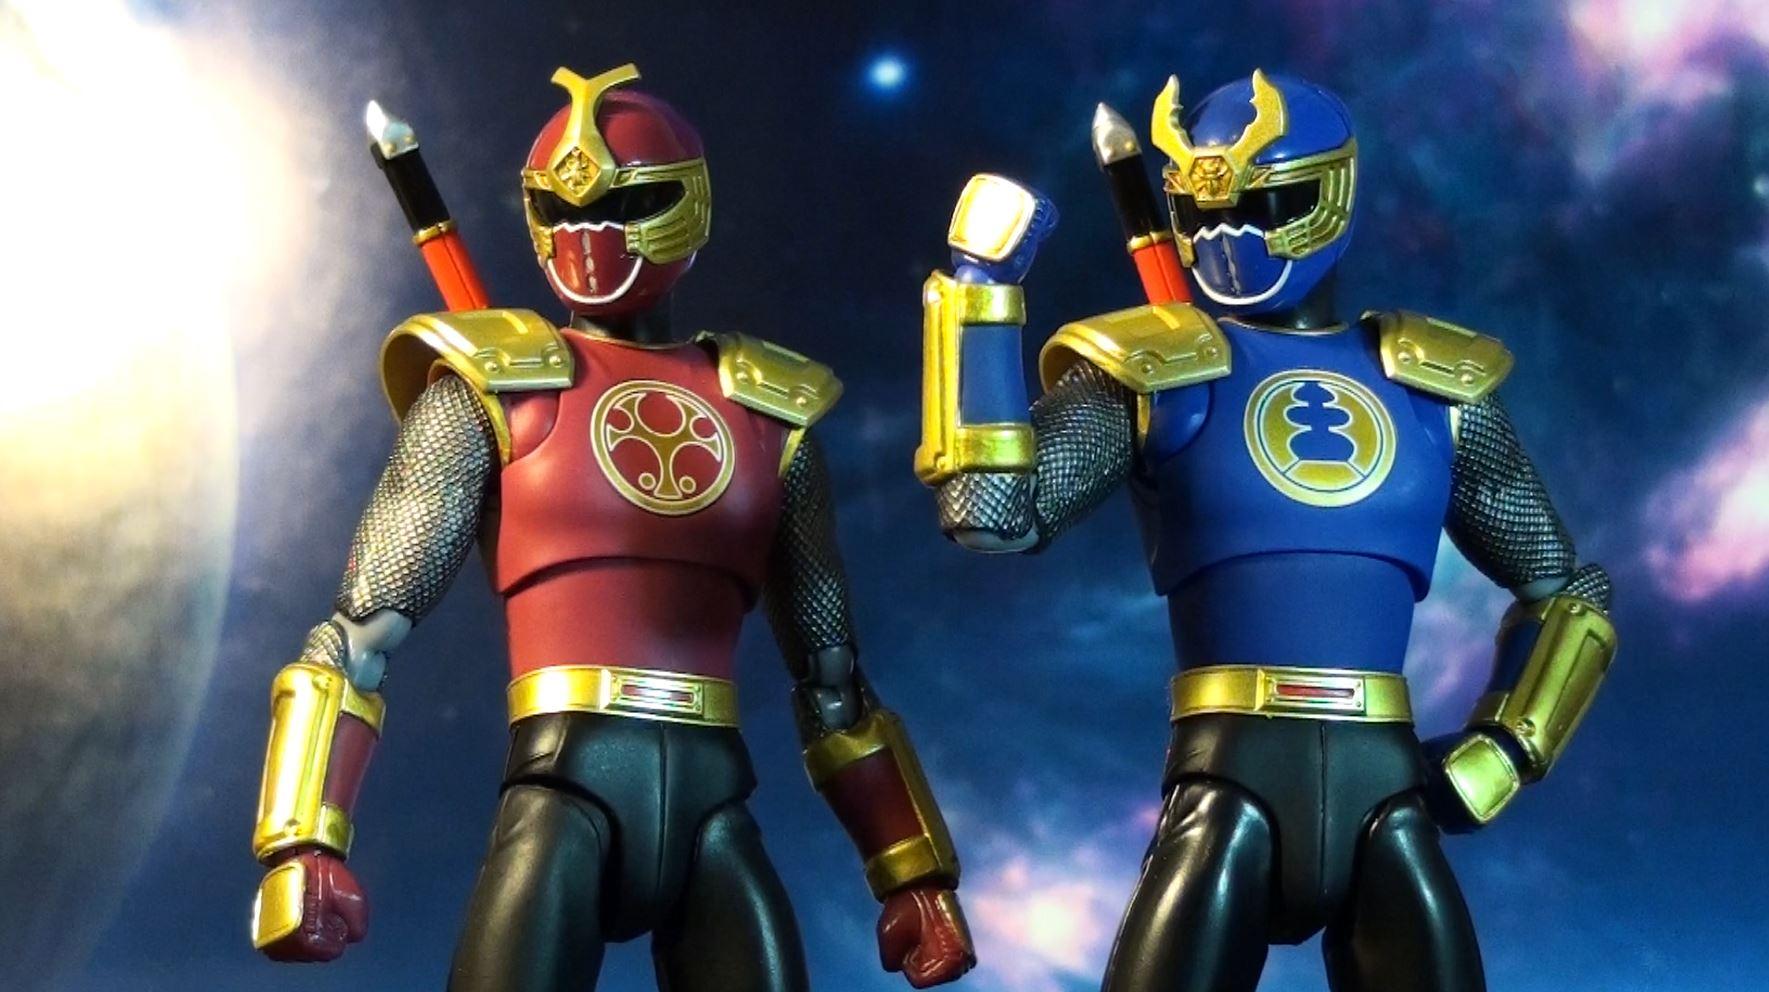 Bandai S.H. Figuarts Super Sentai | Welcome to HDToyTheater